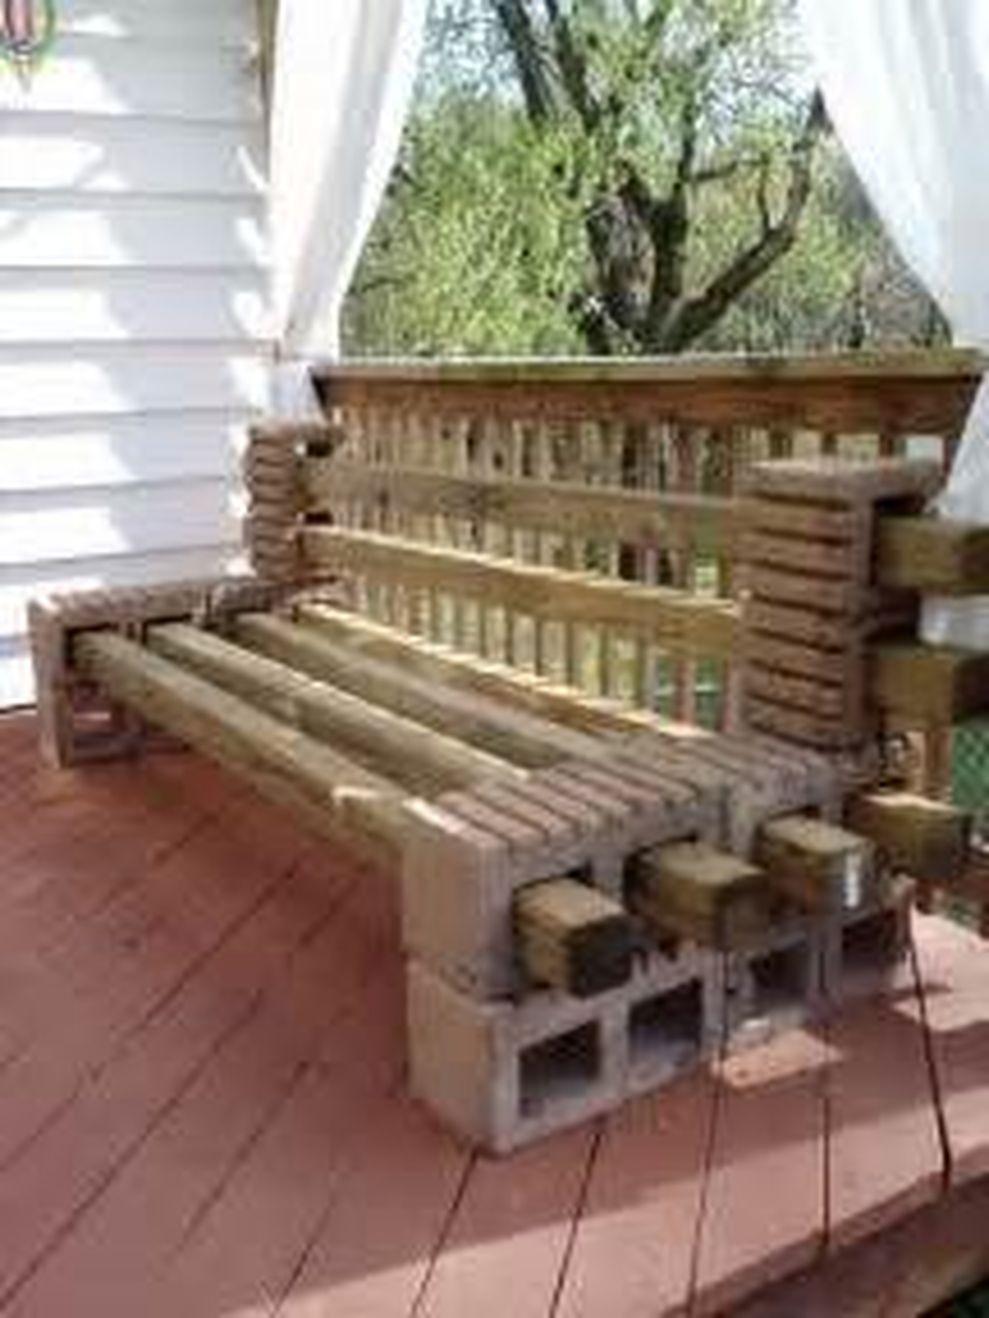 Cinder block furniture backyard 01